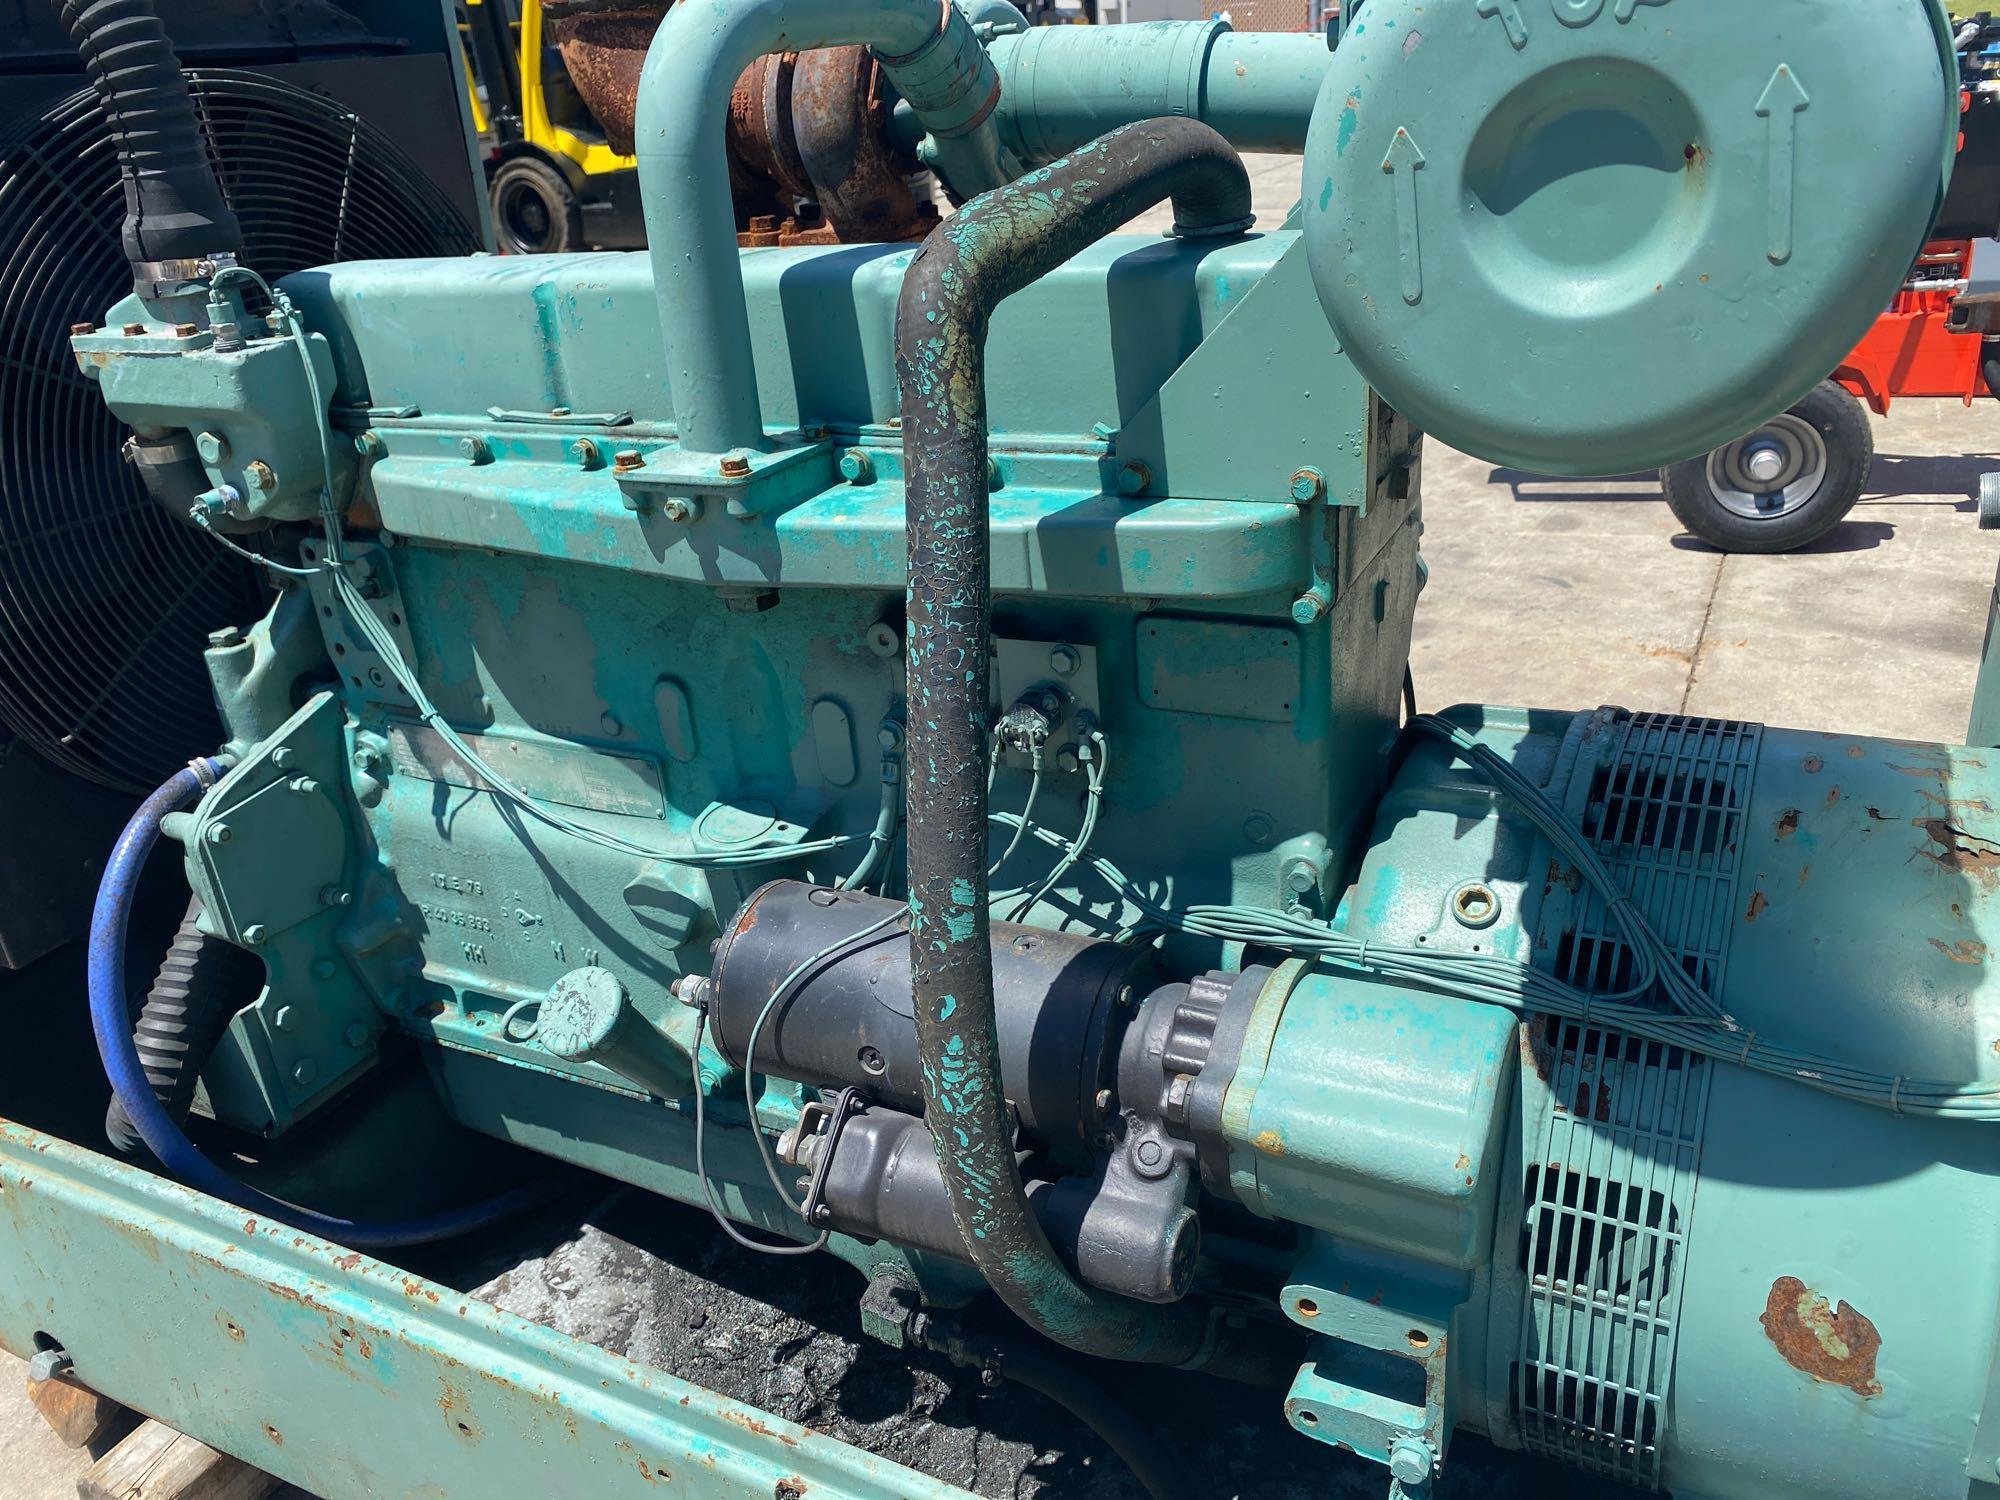 ONAN 90 DYC GENERATOR, 90 KW, 112KVA, 1085 HOURS SHOWING - Image 10 of 11